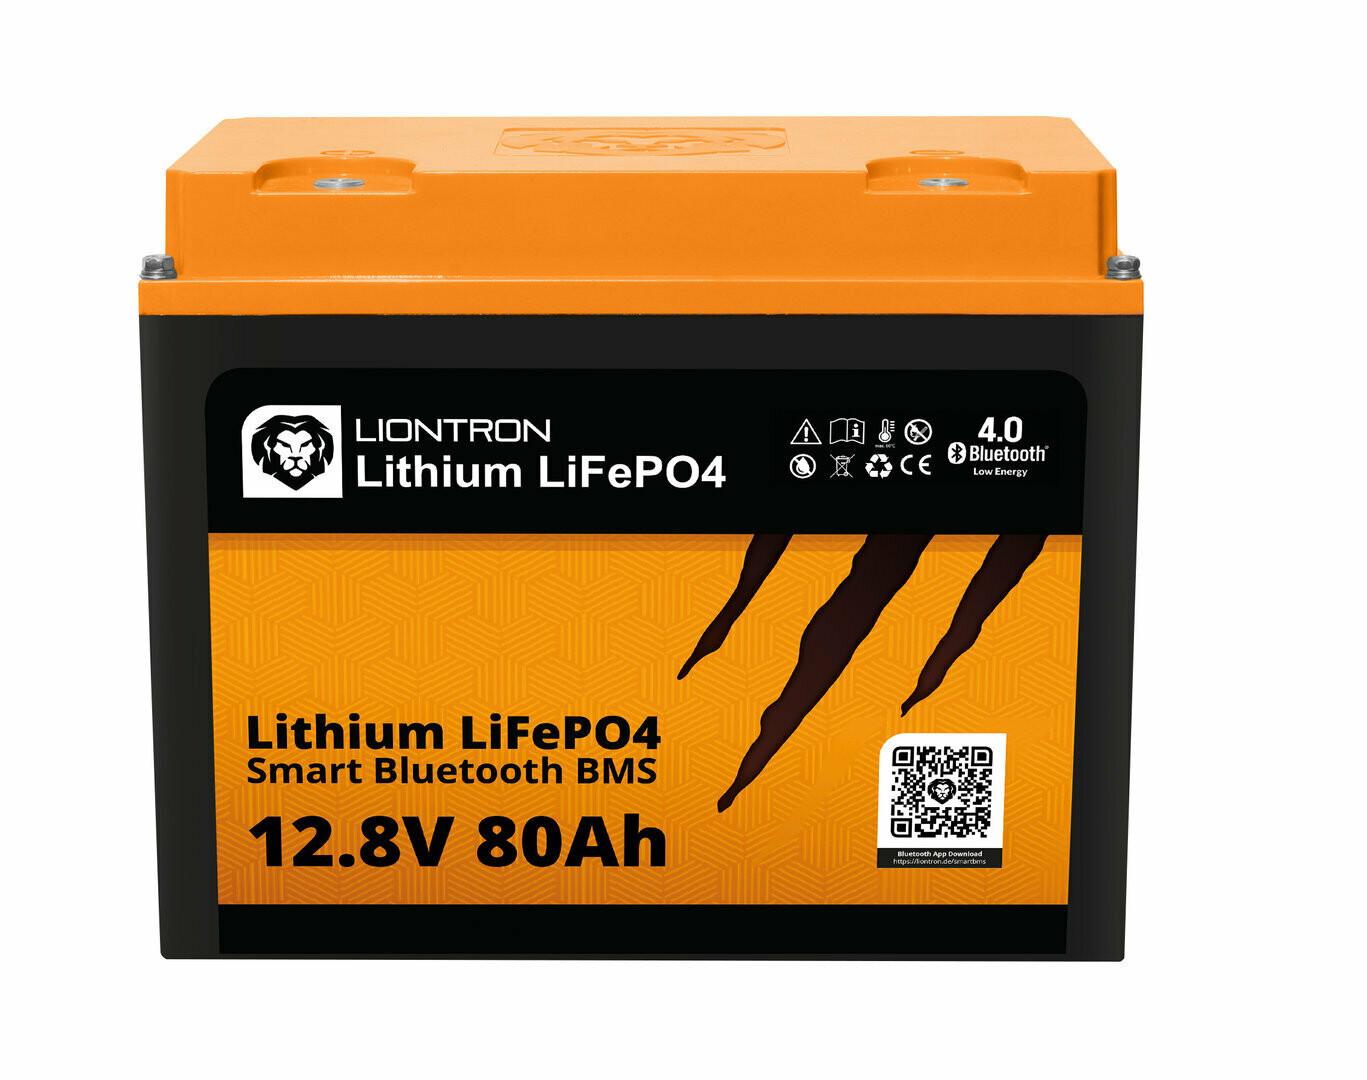 LIONTRON Lithium LiFePO4 LX Smart BMS 12,8V 80Ah